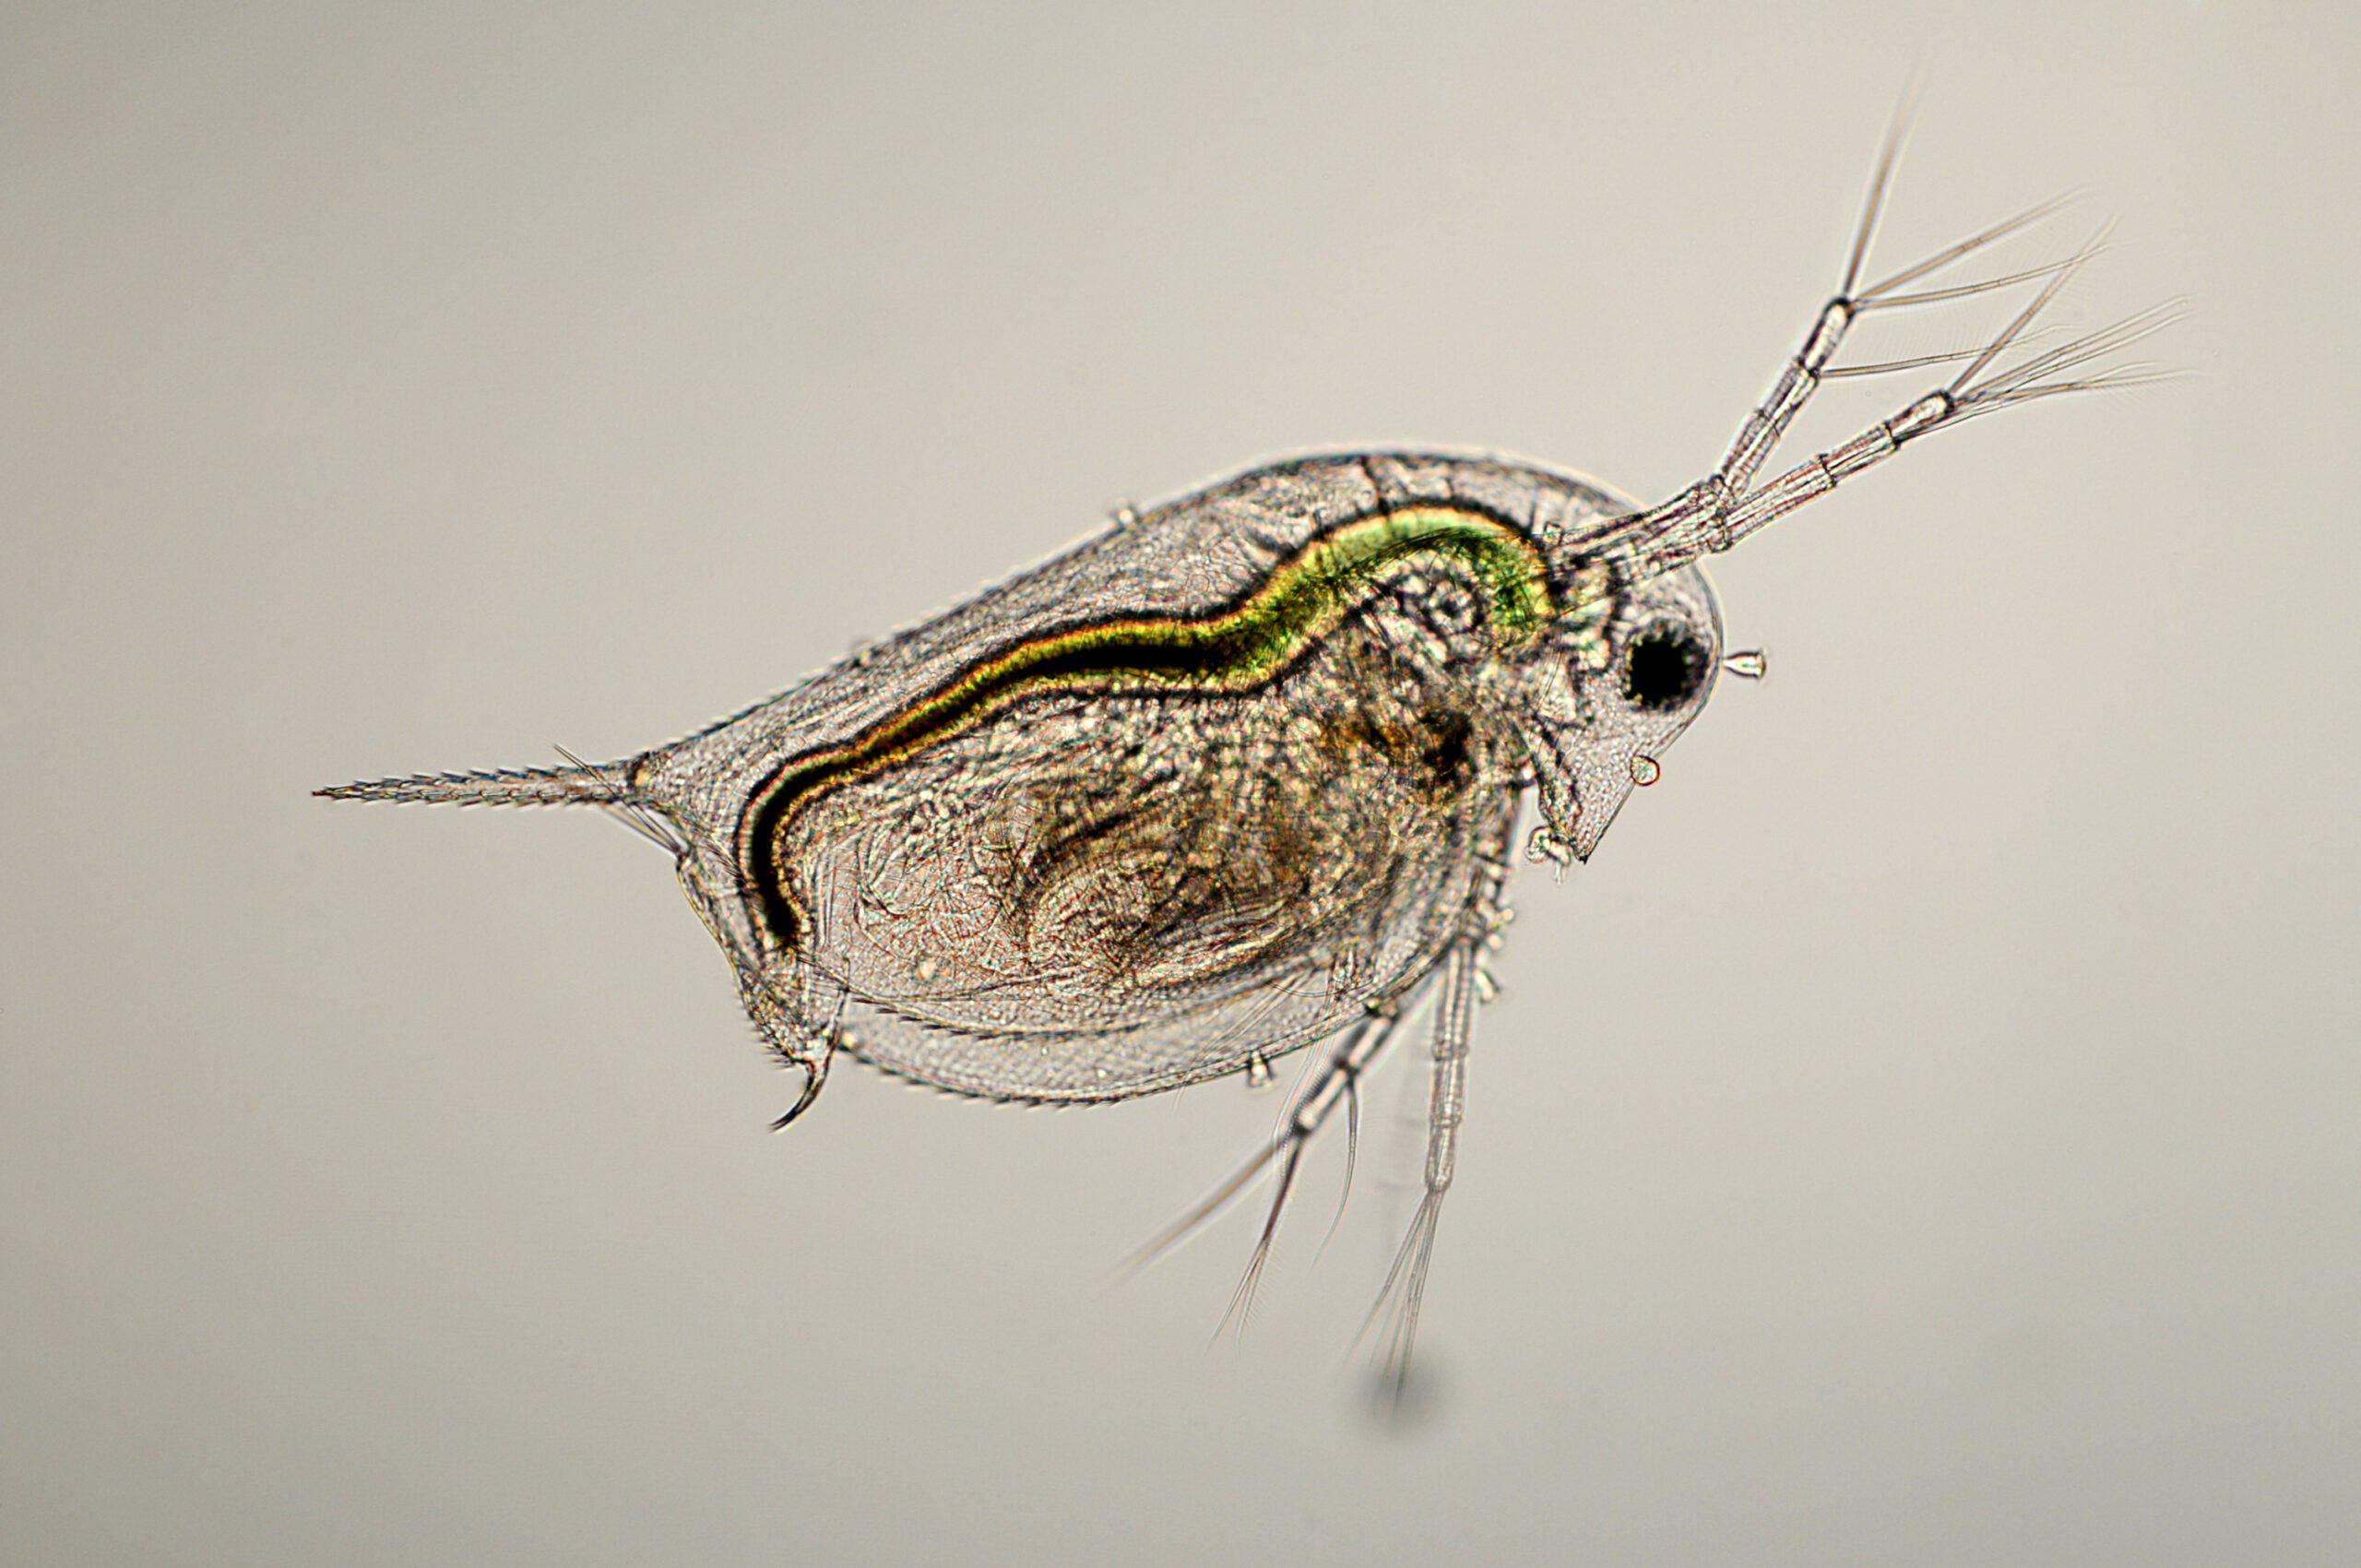 Daphnia species micrograph